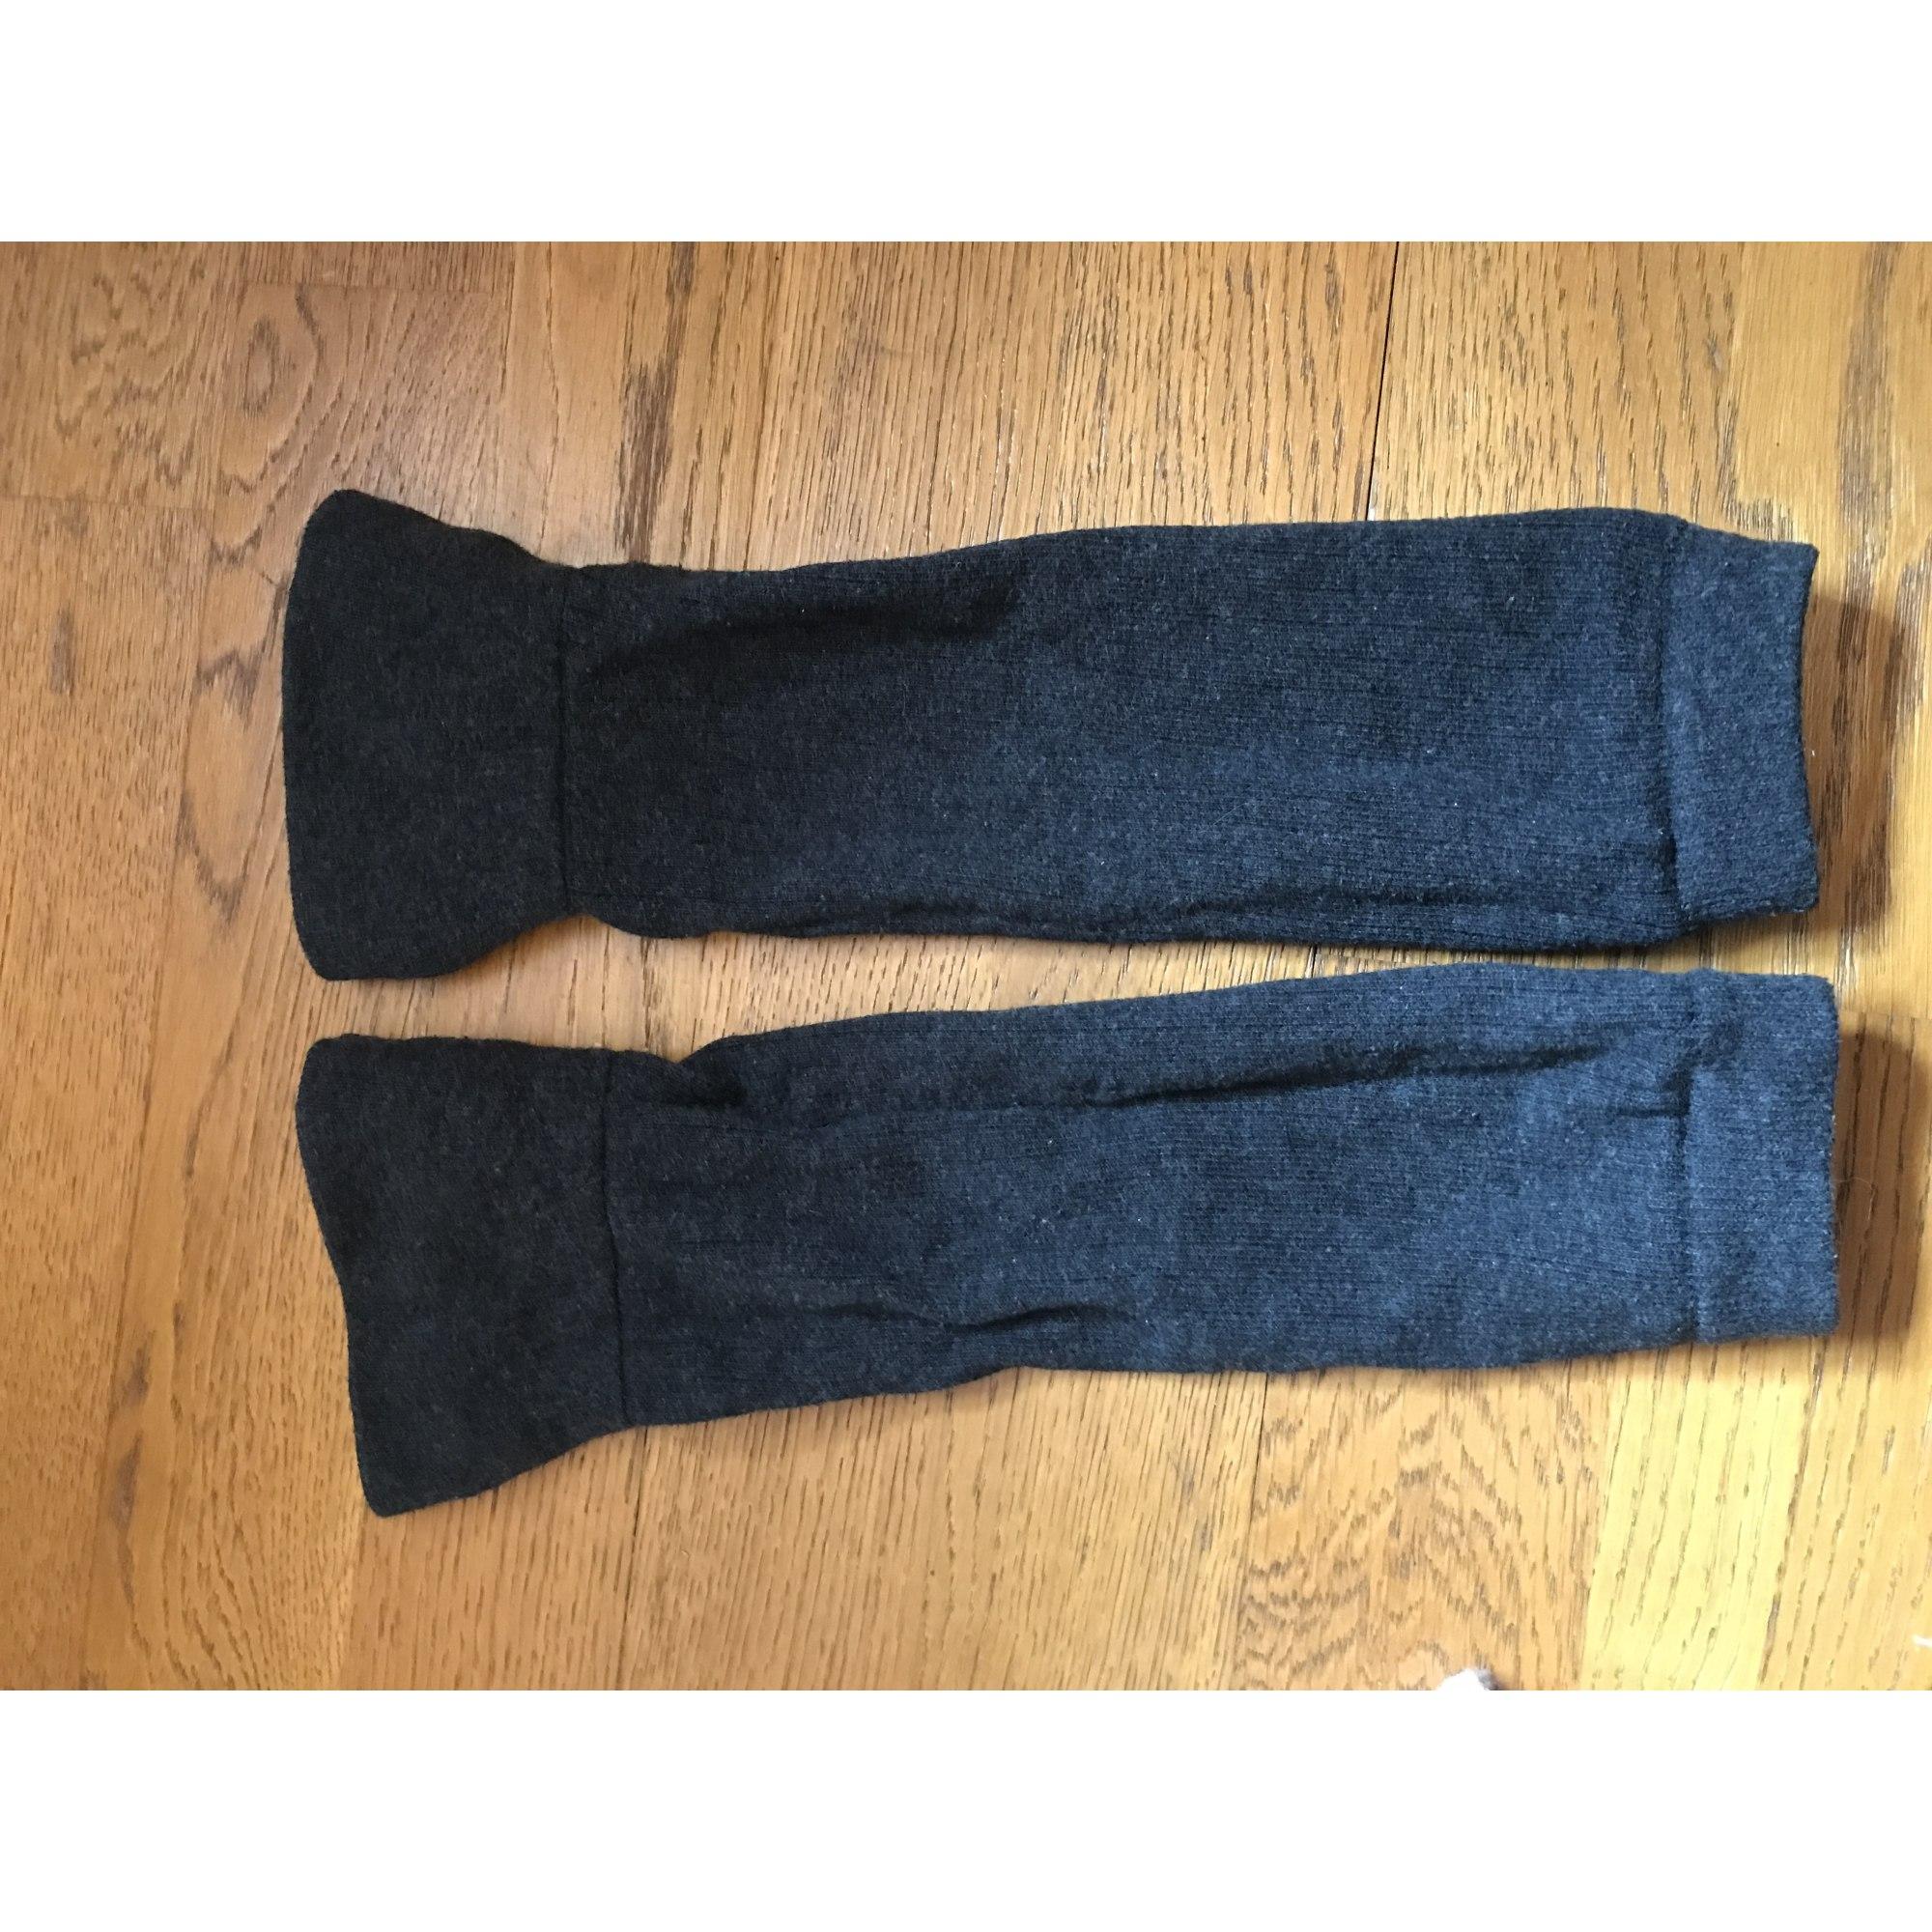 Mi-chausettes H&M Gris, anthracite